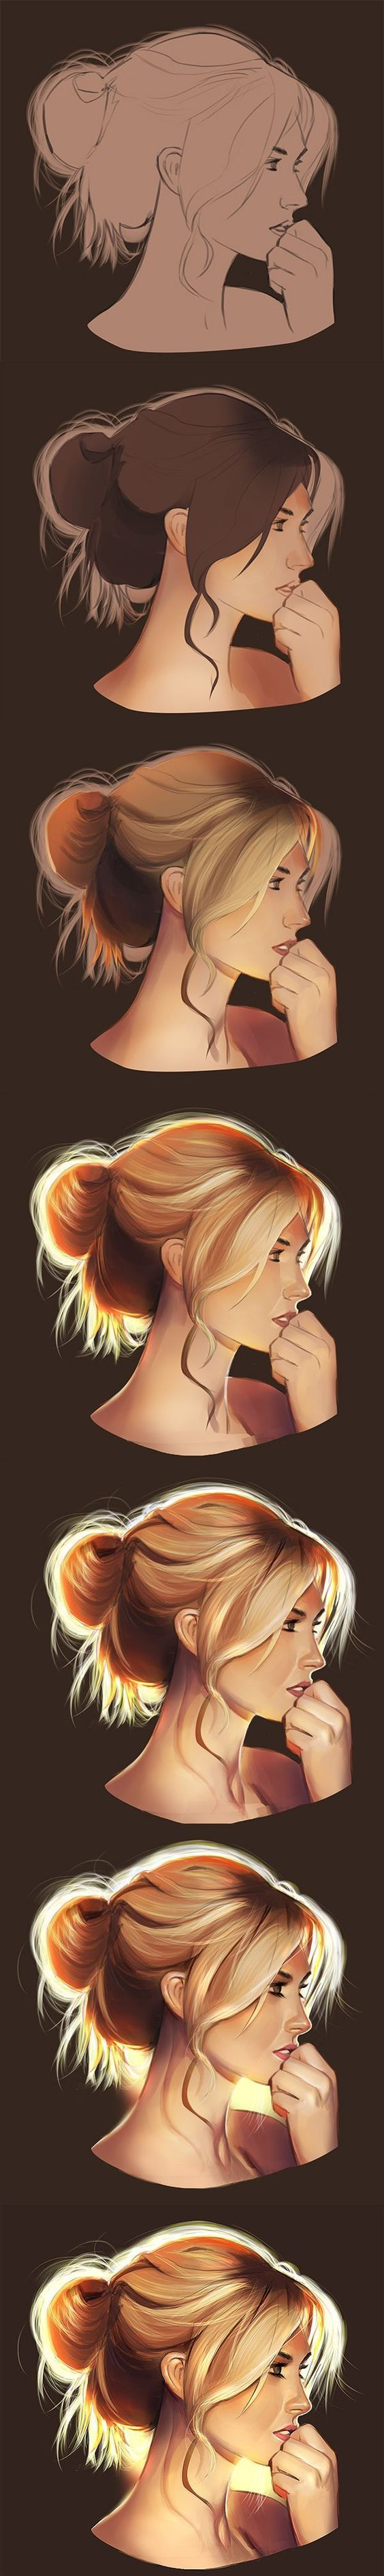 amateur tumblr blond skinny girls,